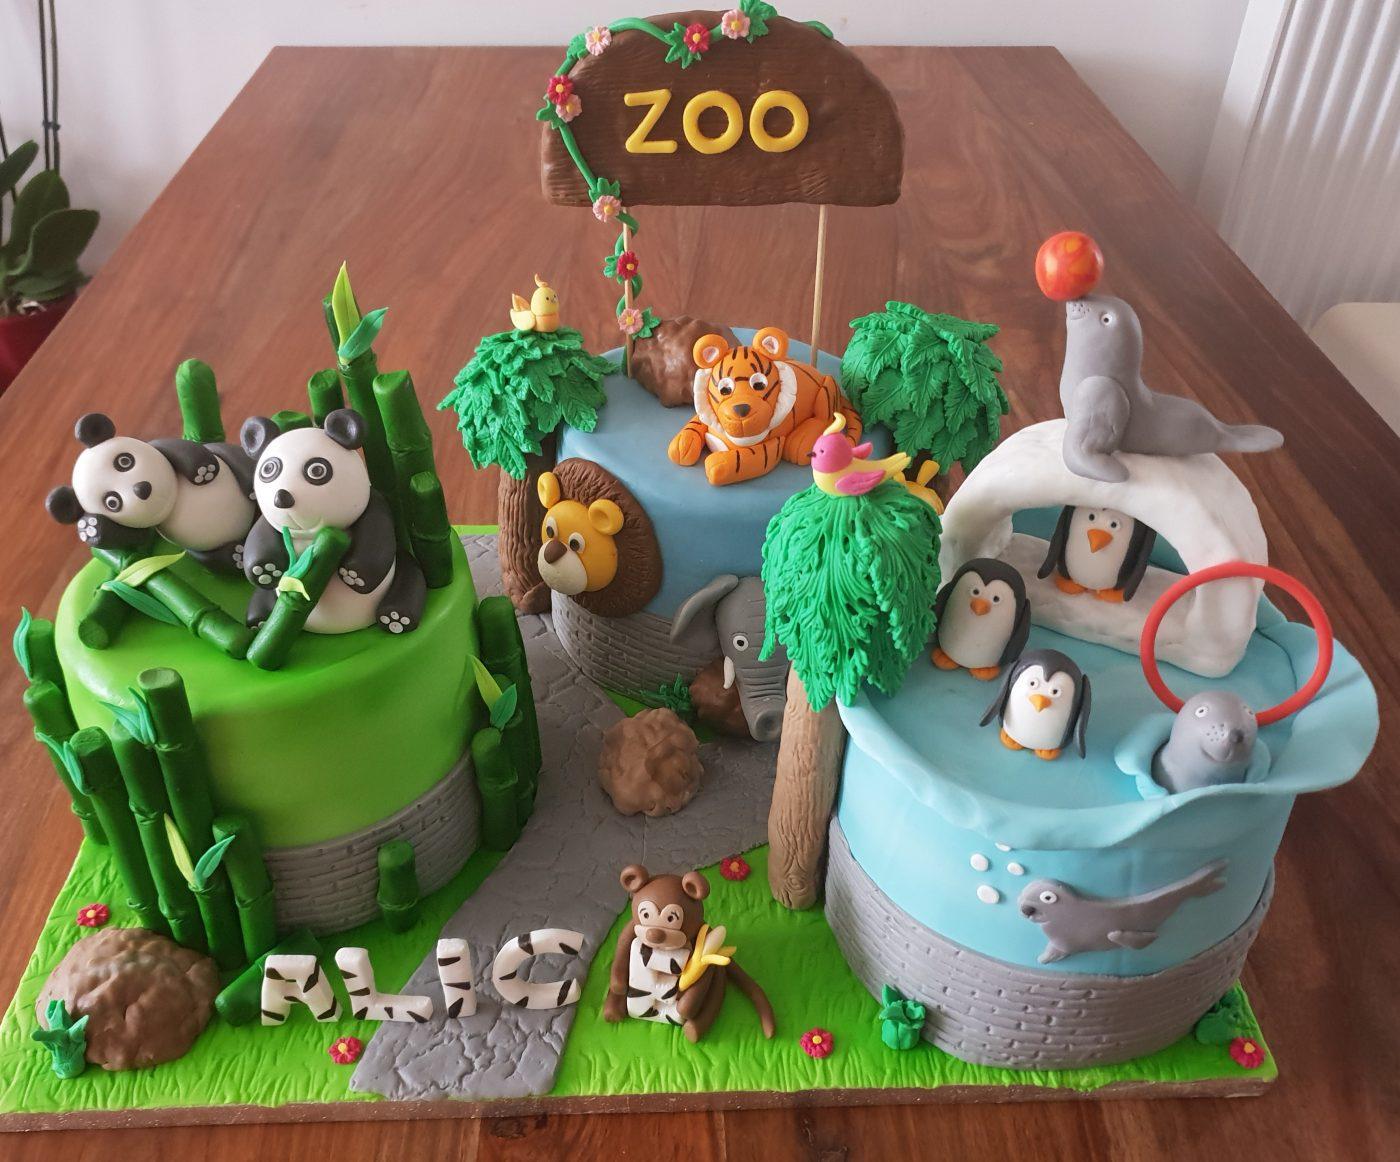 Zoo cake design